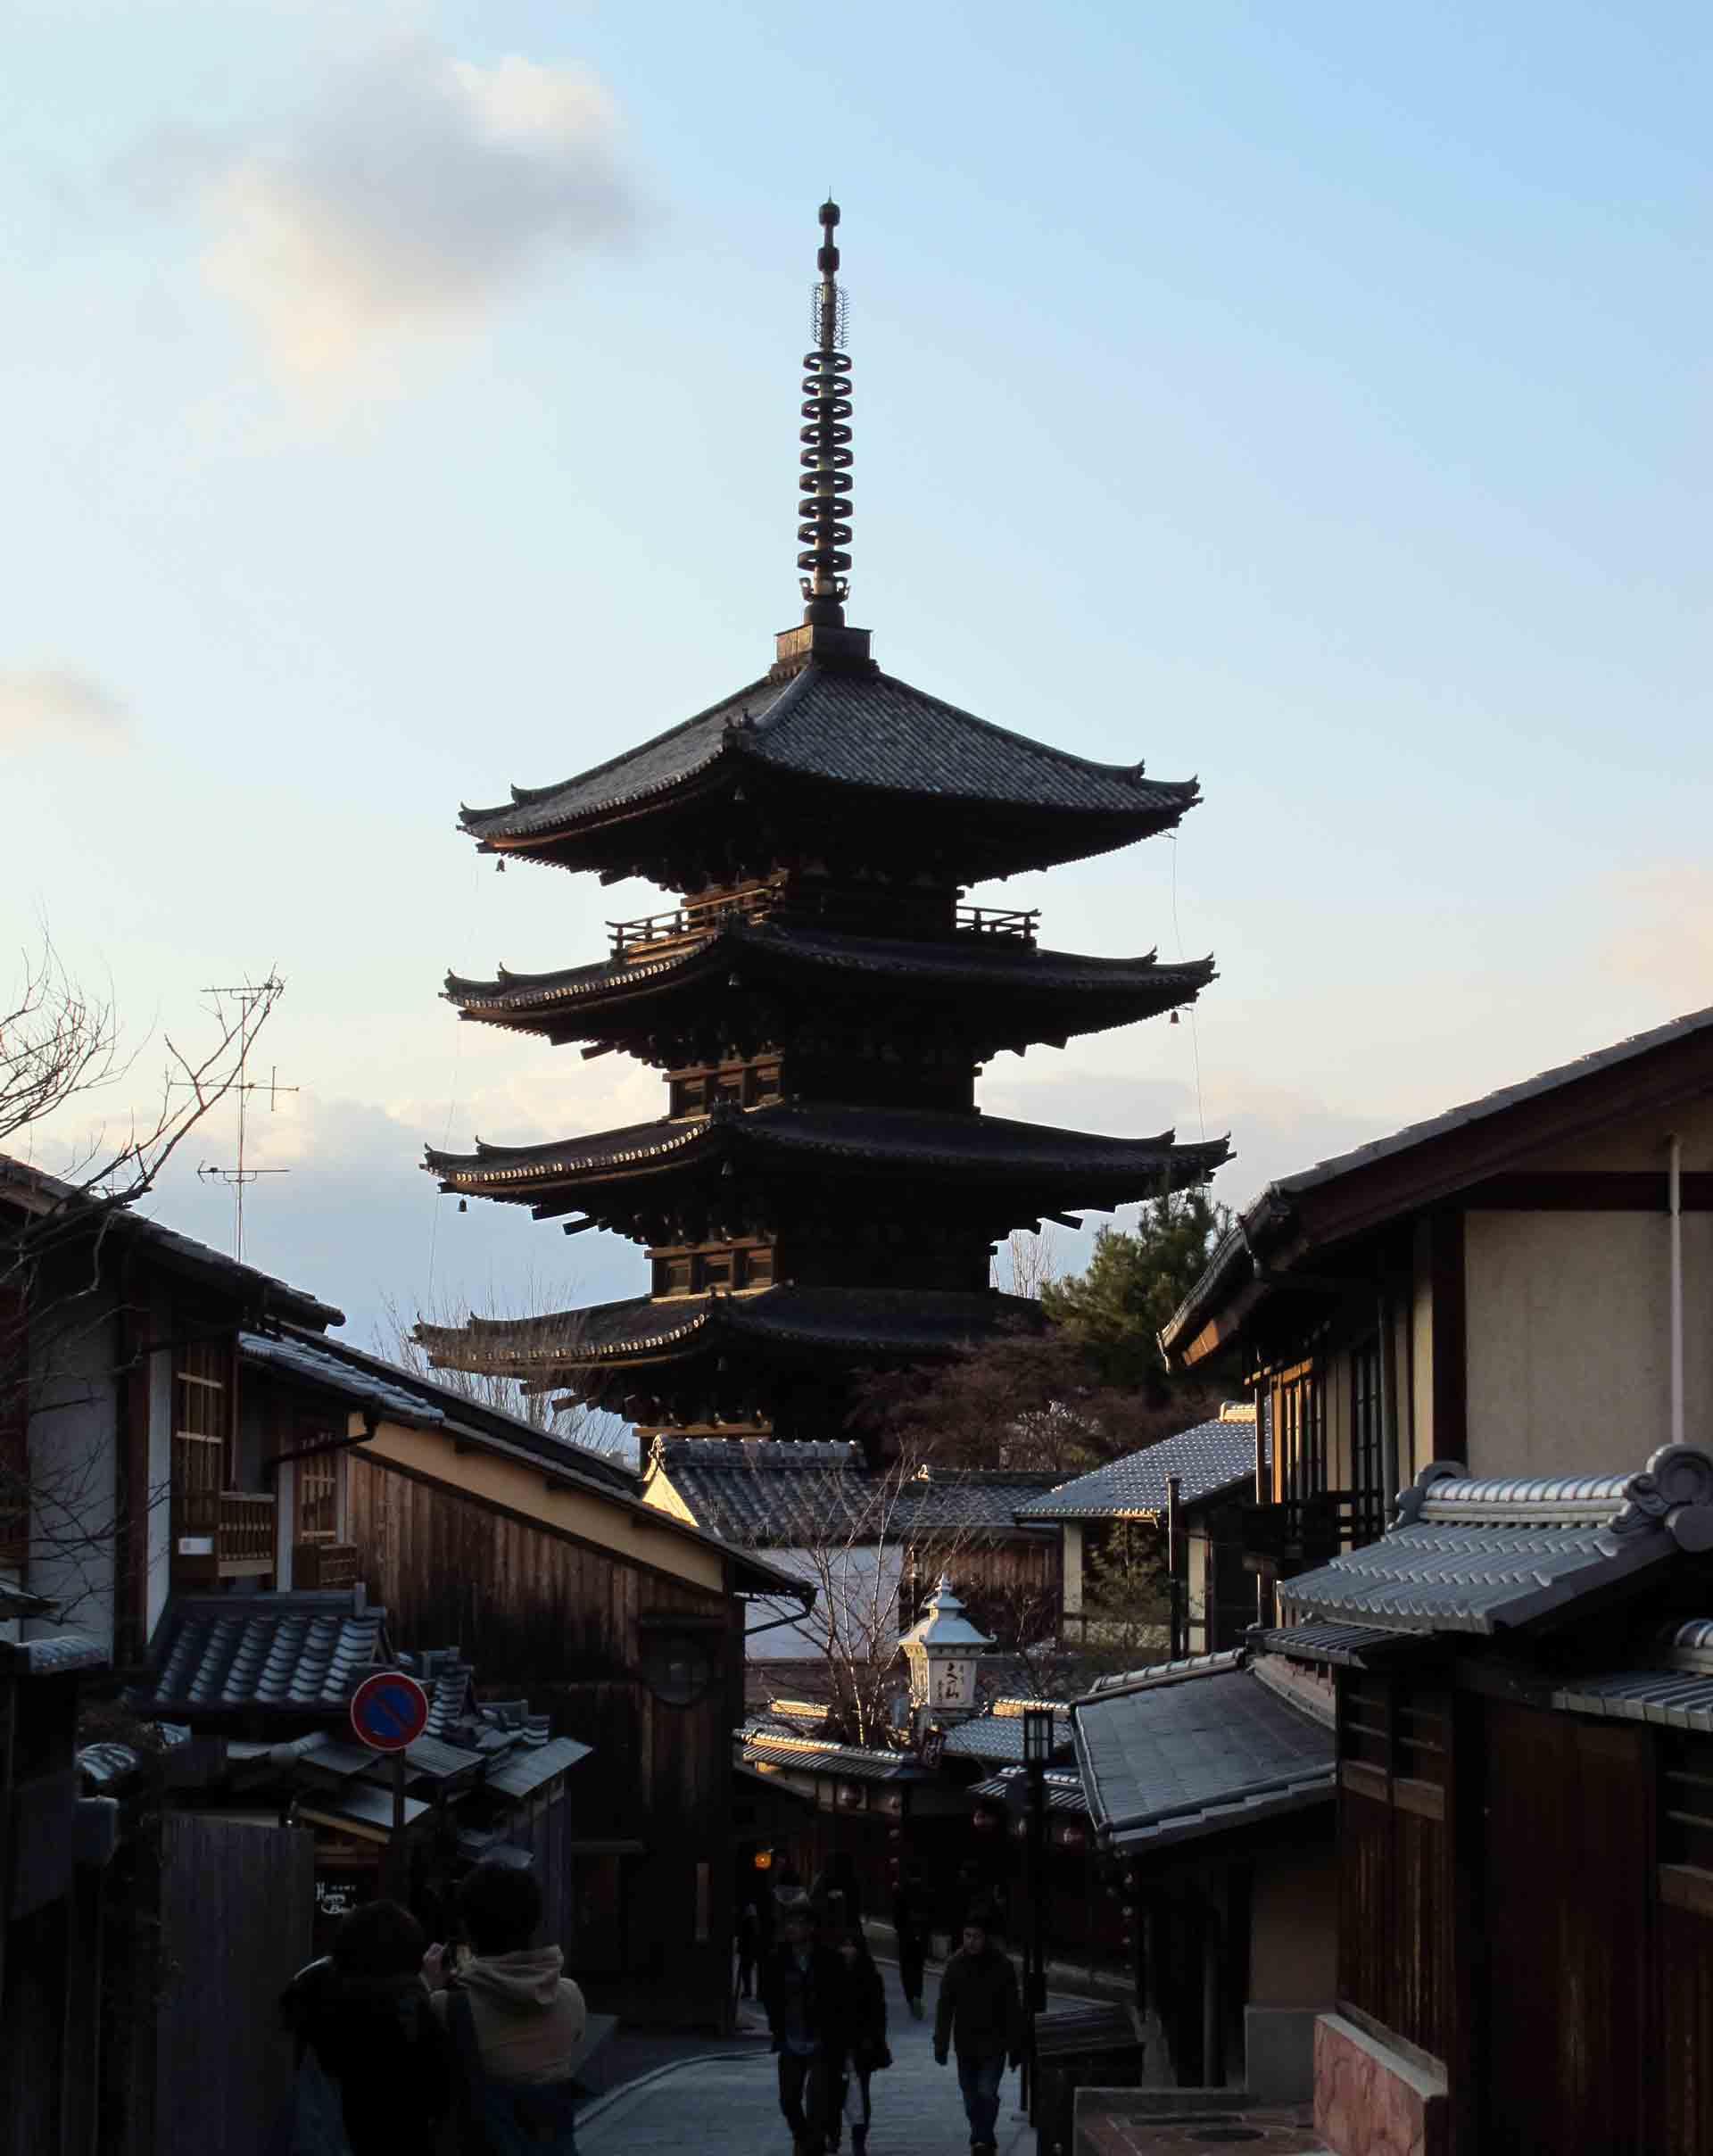 Kyoto-Higashiyama-with-view-of-koyashu-pagoda